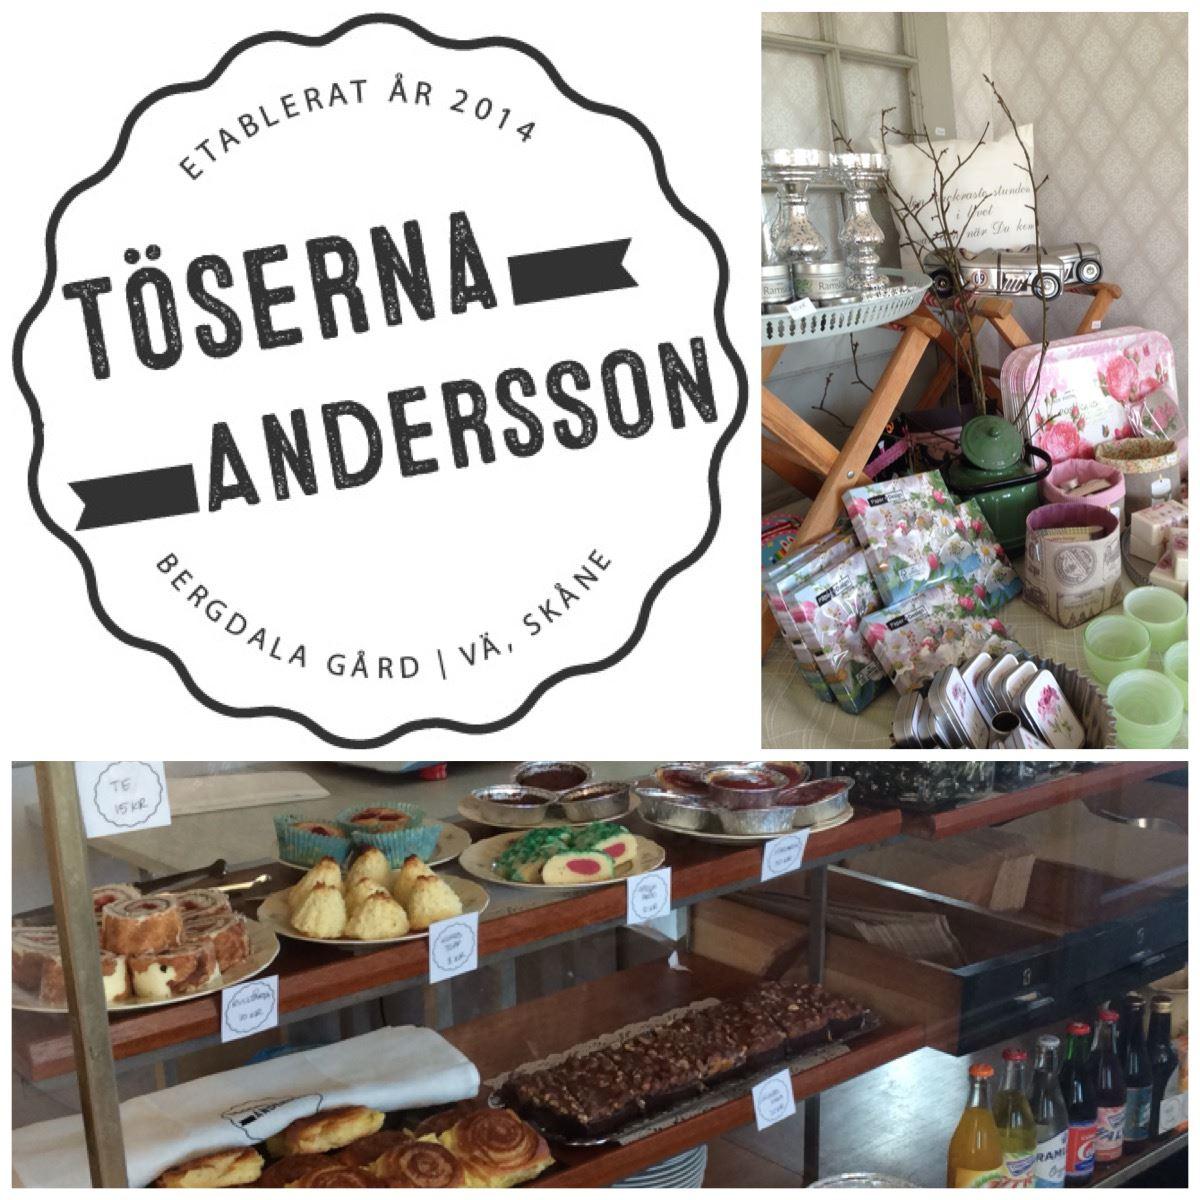 Töserna Andersson - shop and café